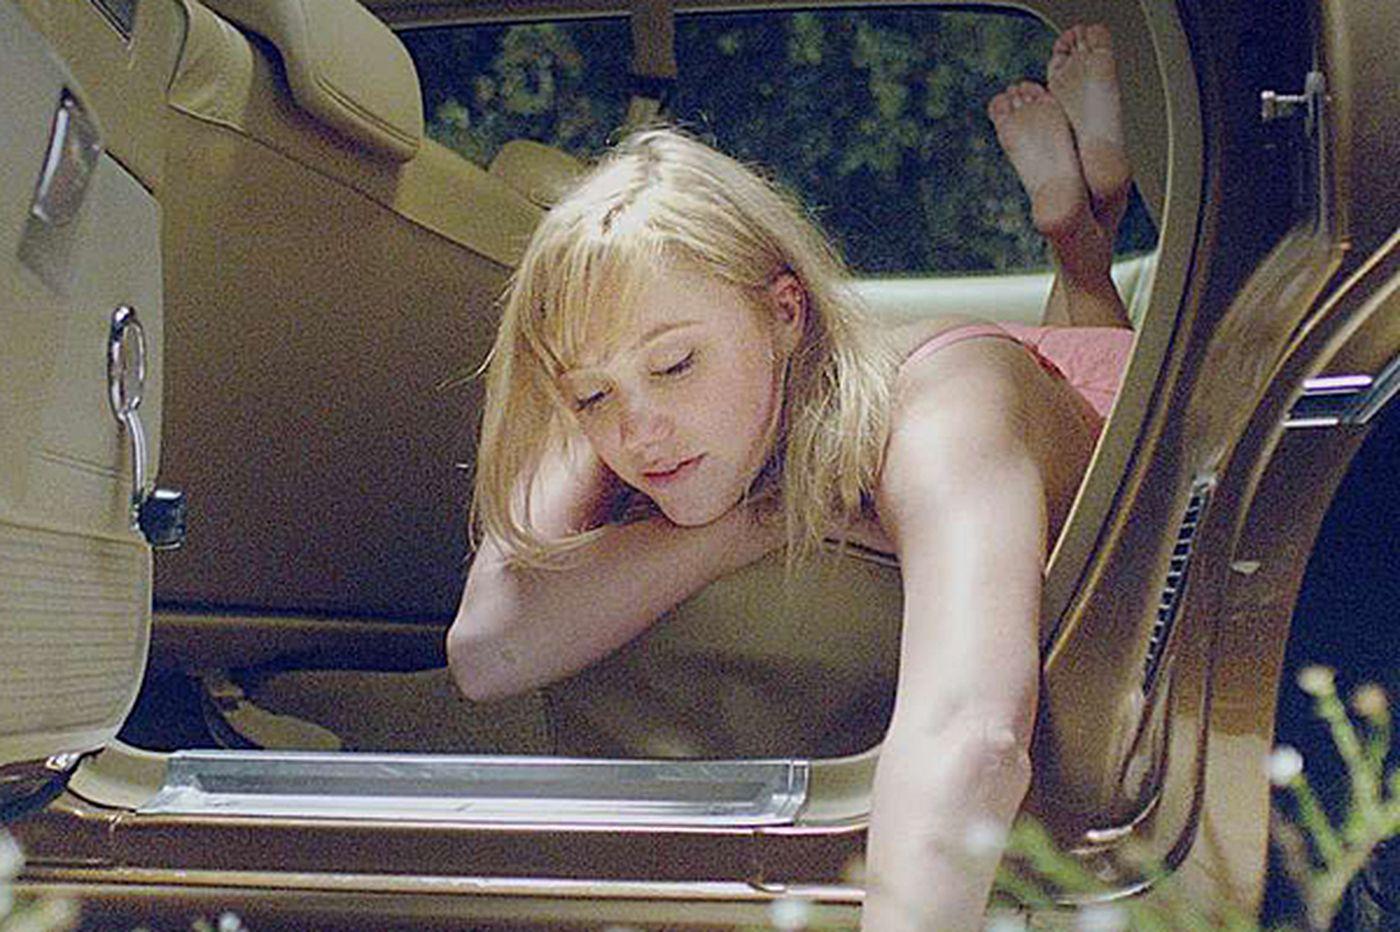 'It Follows': Masterful, beautiful, creepy take on teen horror